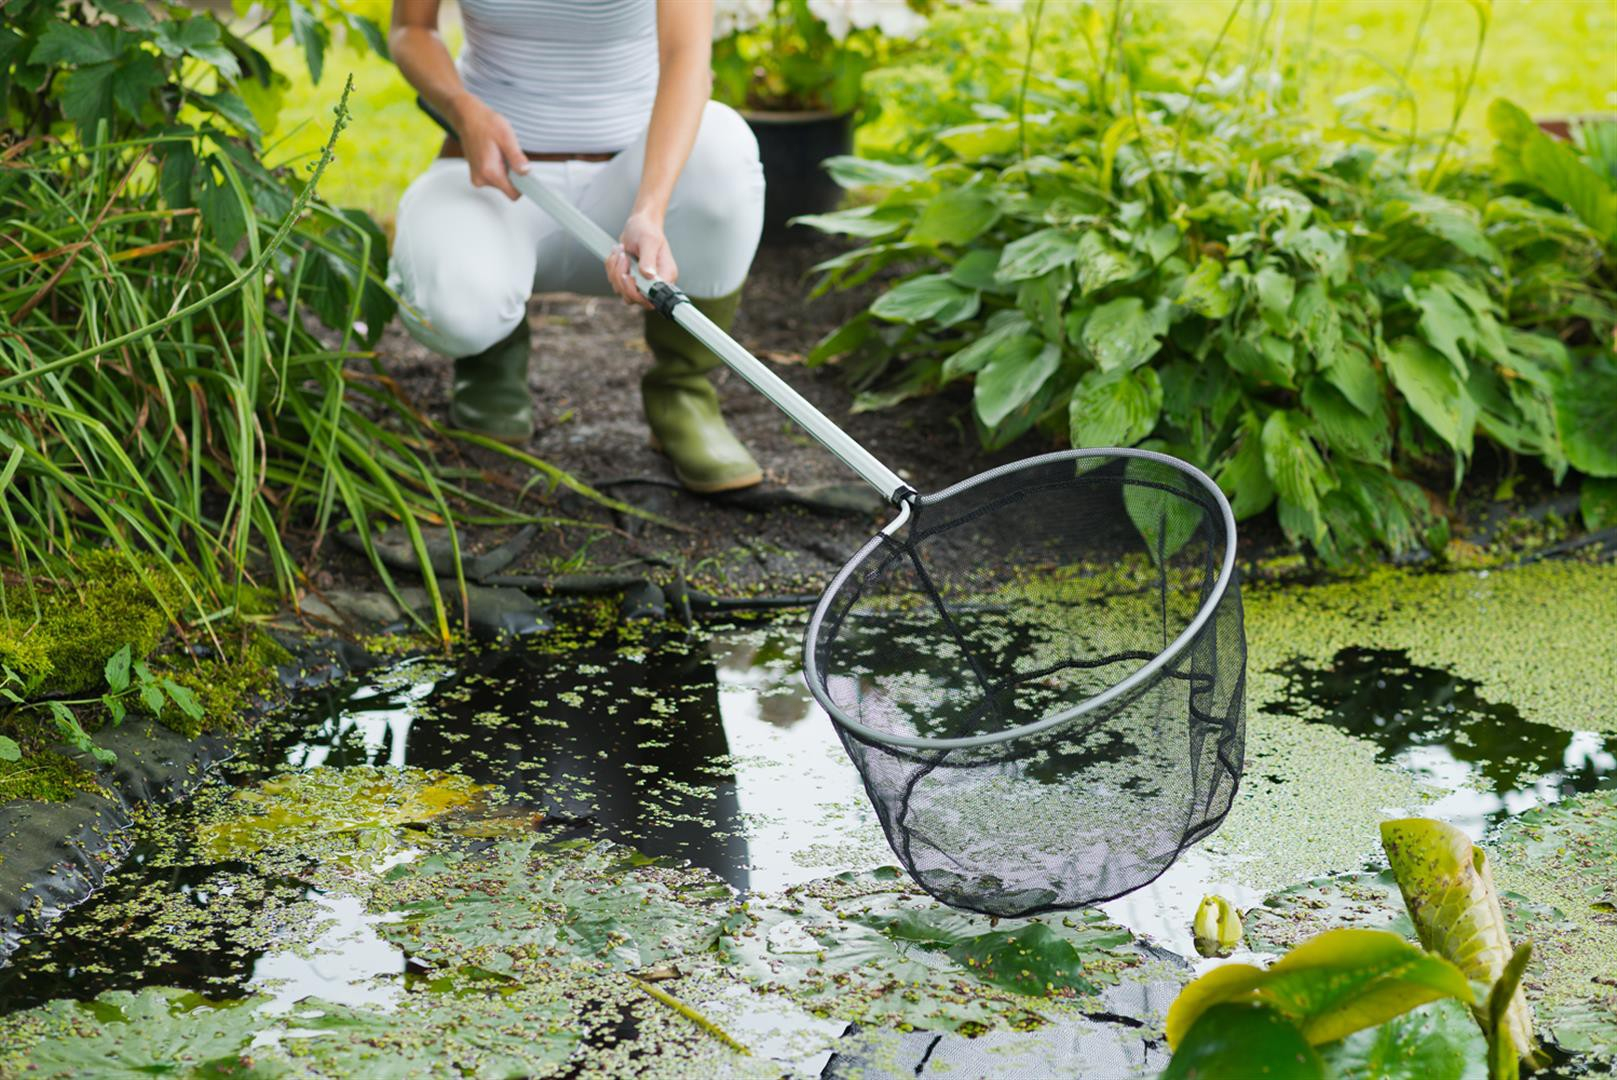 Bien Entretenir Votre Bassin De Jardin dedans Entretien D Un Bassin De Jardin